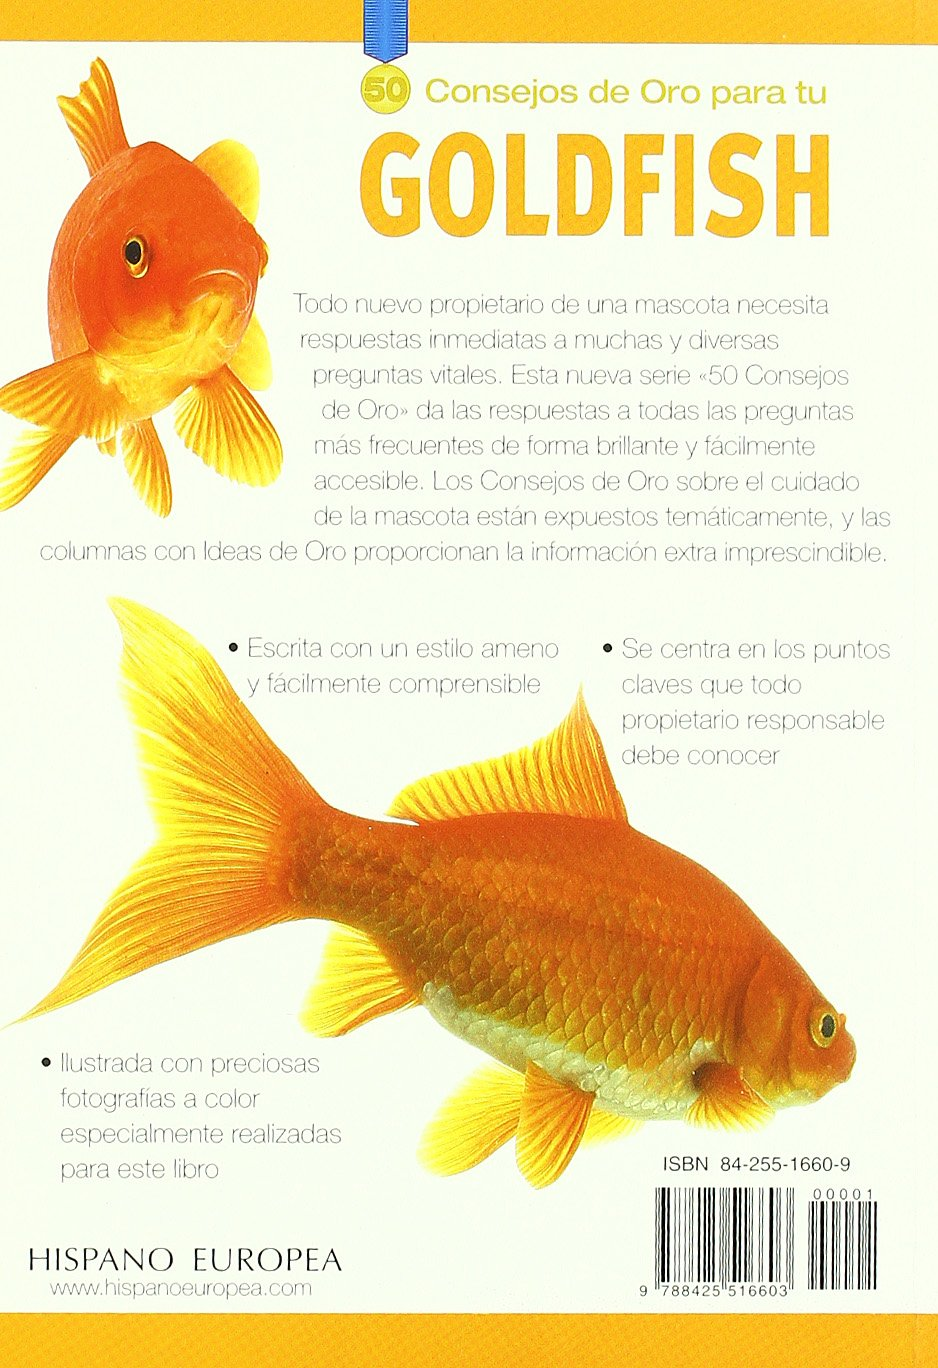 50 consejos de oro para tu Goldfish/ Gold Medal Guide, Goldfish (Spanish Edition)